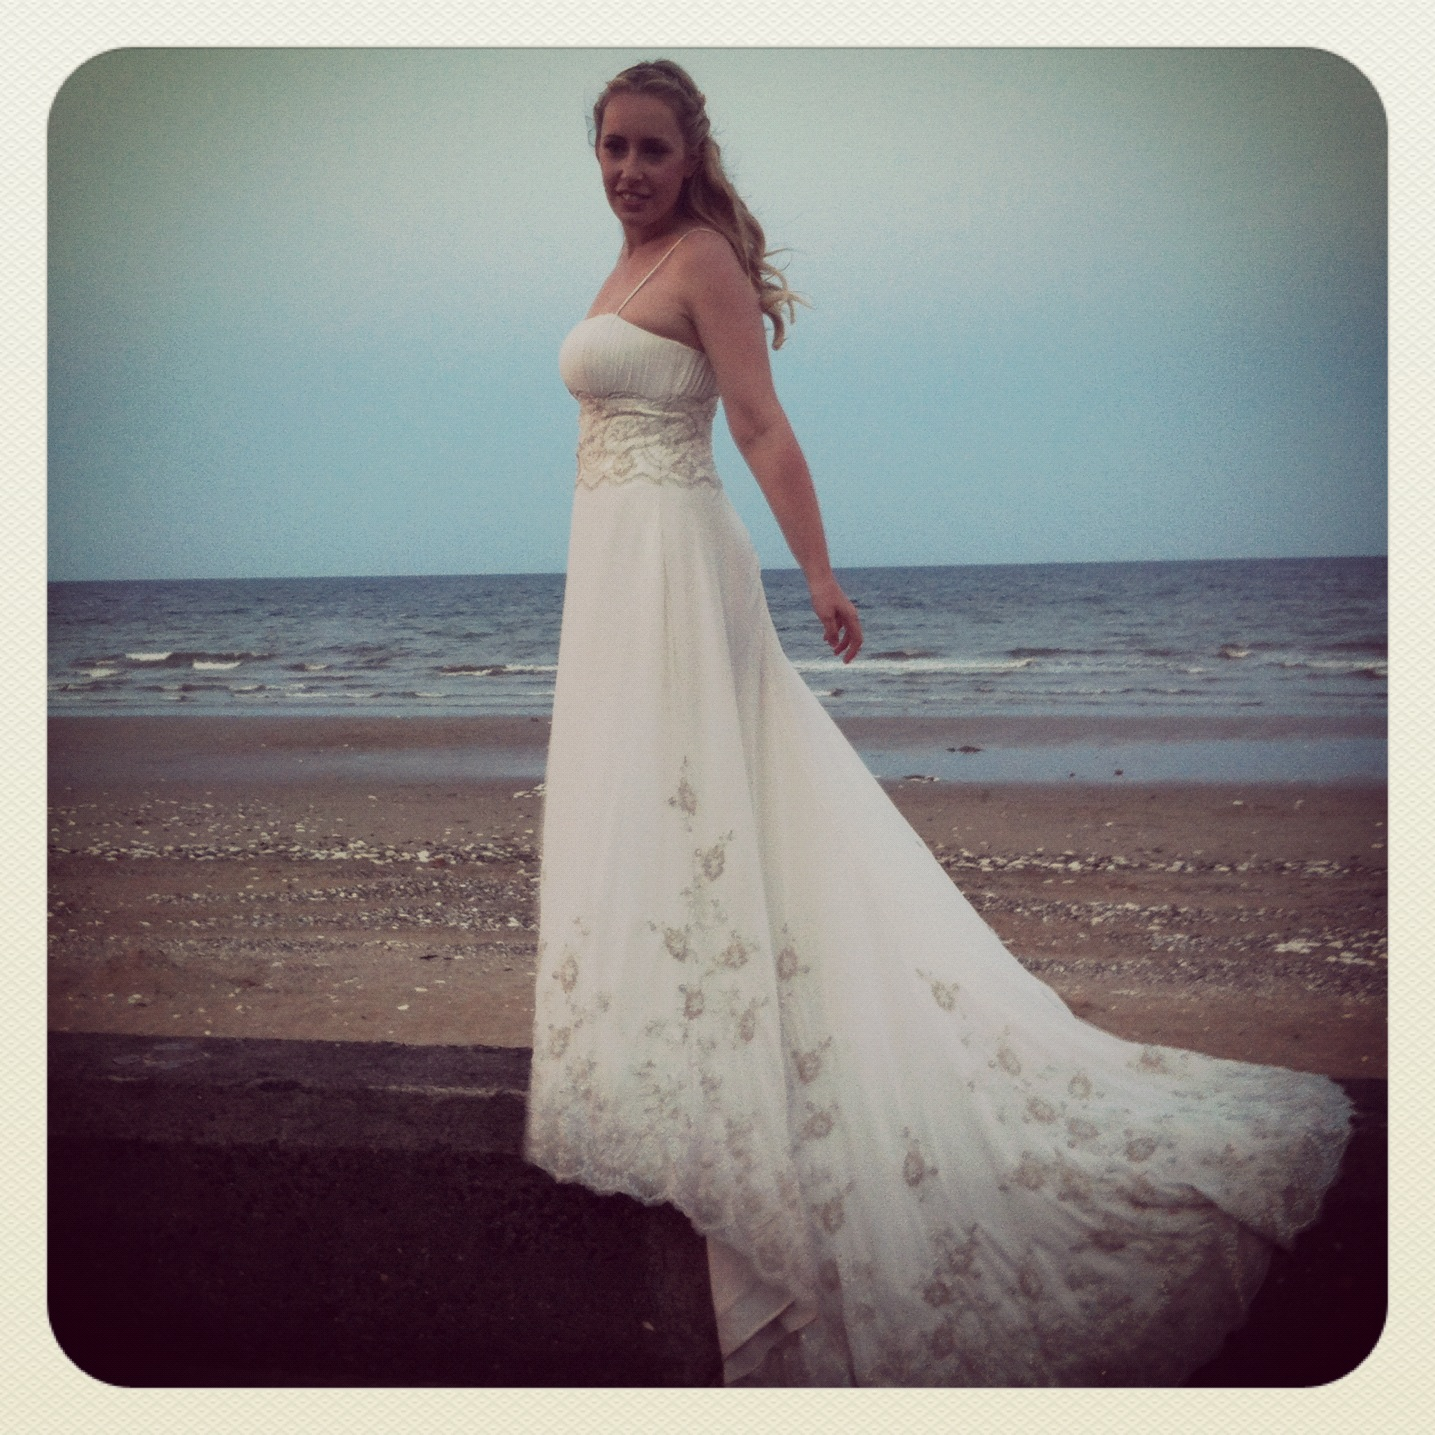 Lauren Cherice Designs: Another Beautiful Wedding to Share...